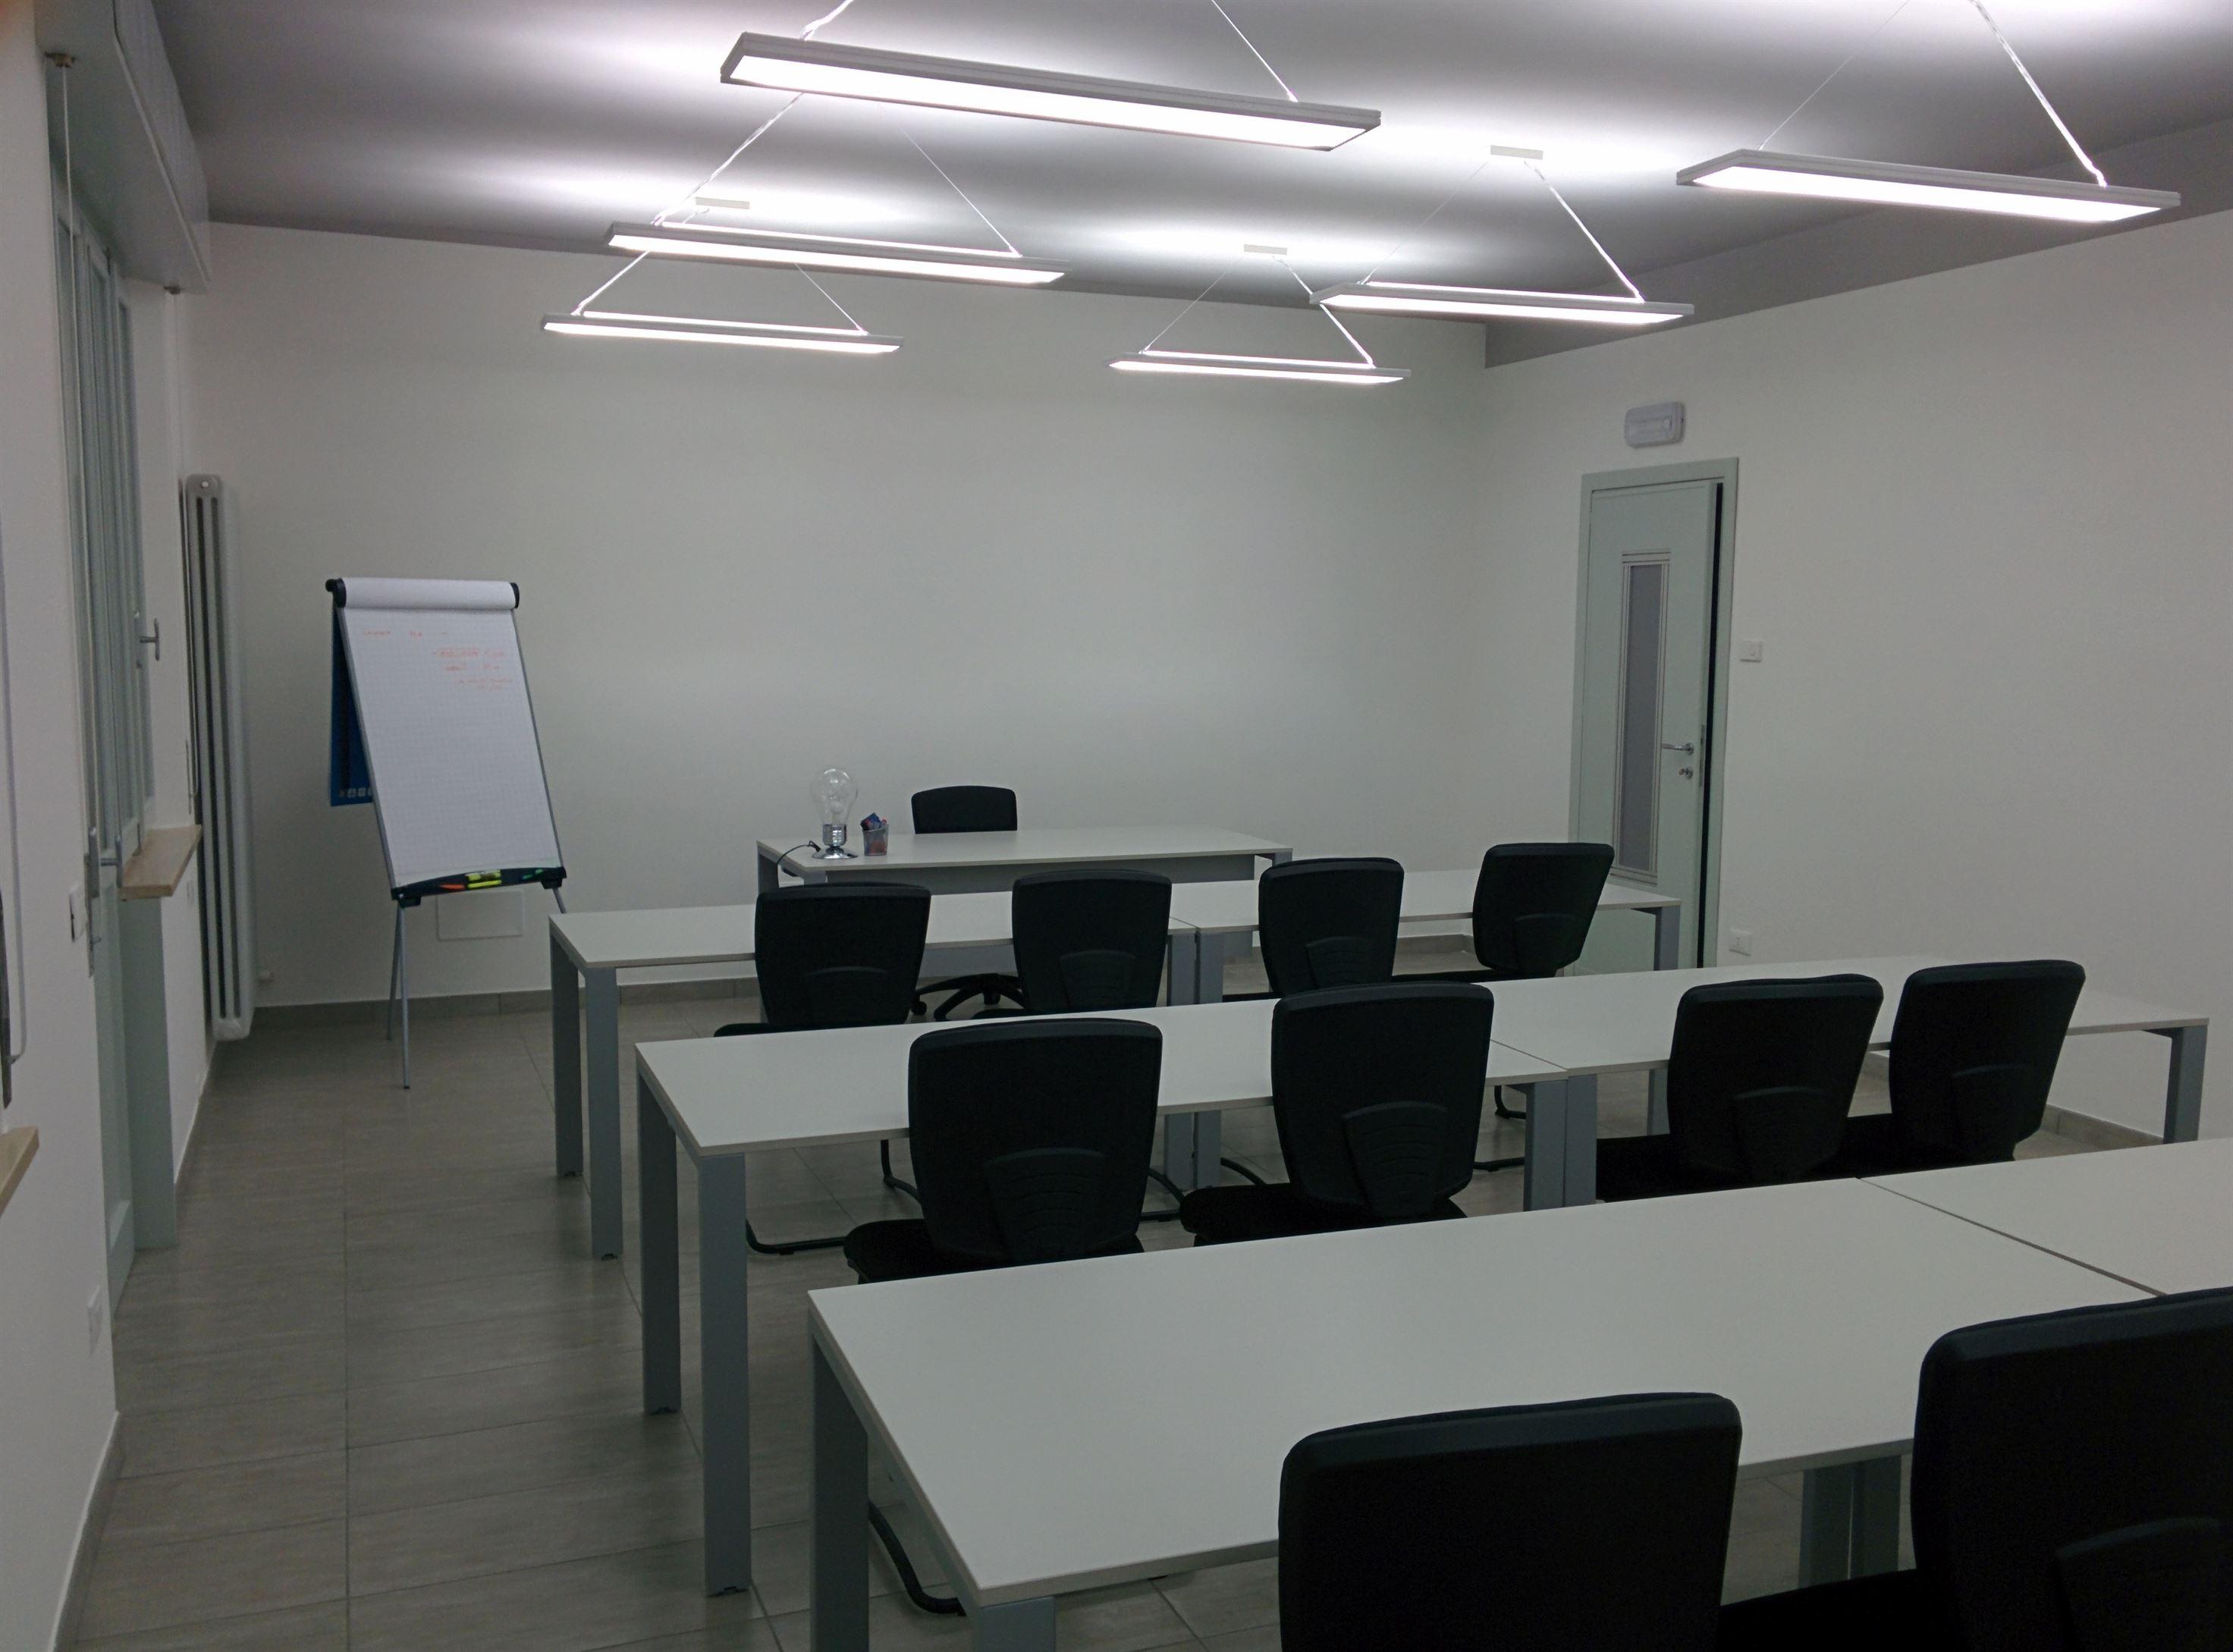 Foto sala formazione BPR Group